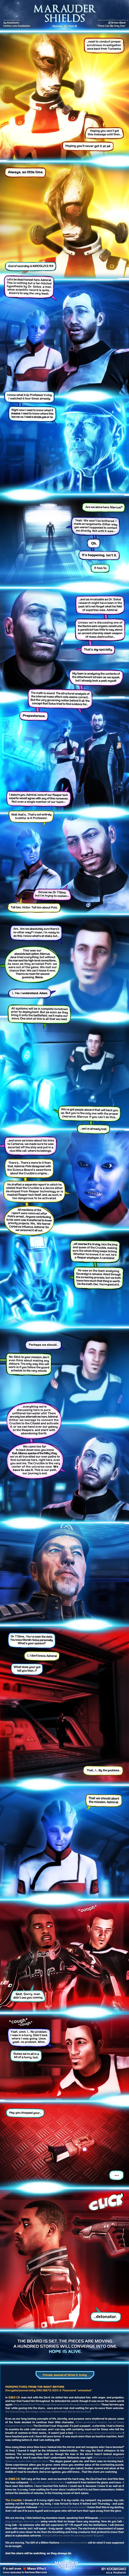 Marauder Shields 35: Plan B (Mass Effect) by koobismo